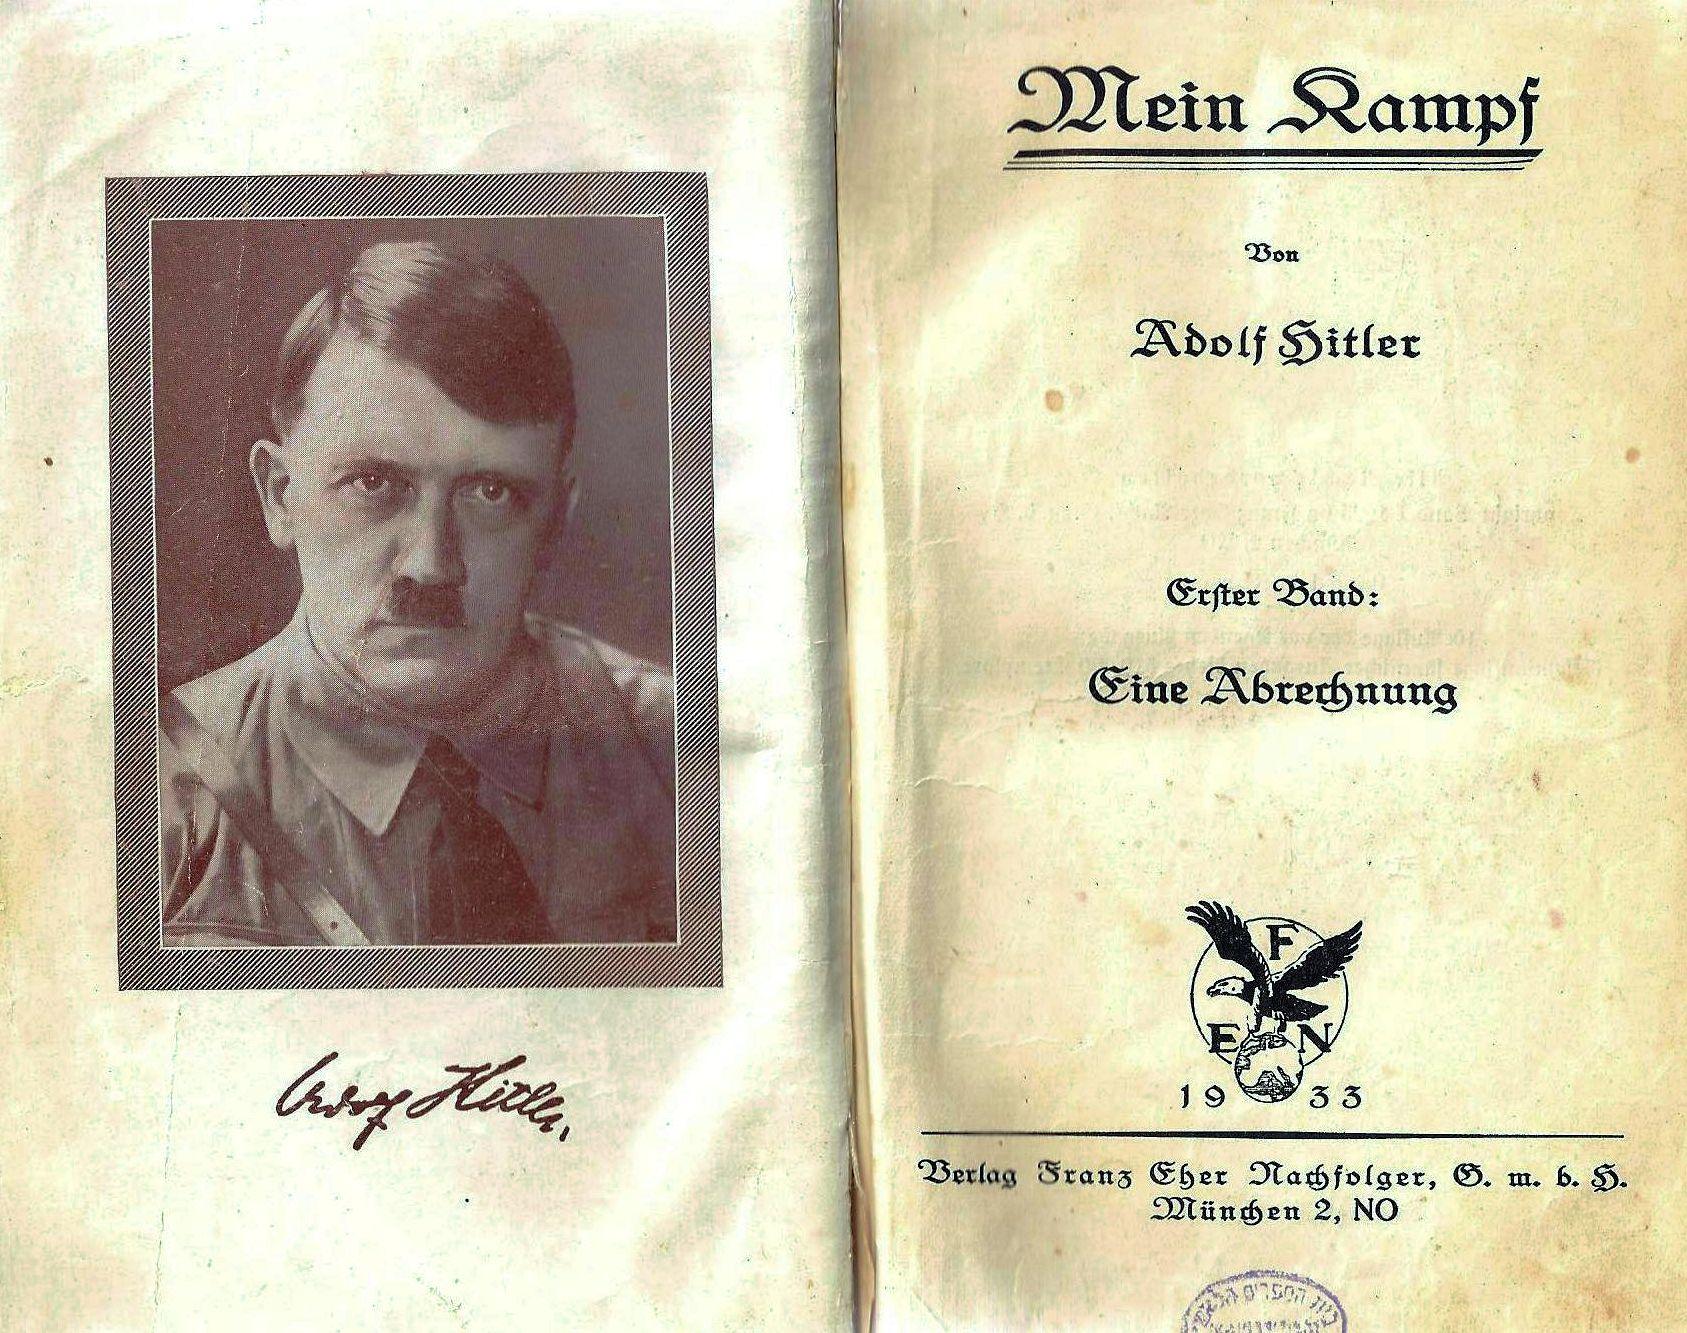 The Nazi Period World War II And Holocaust